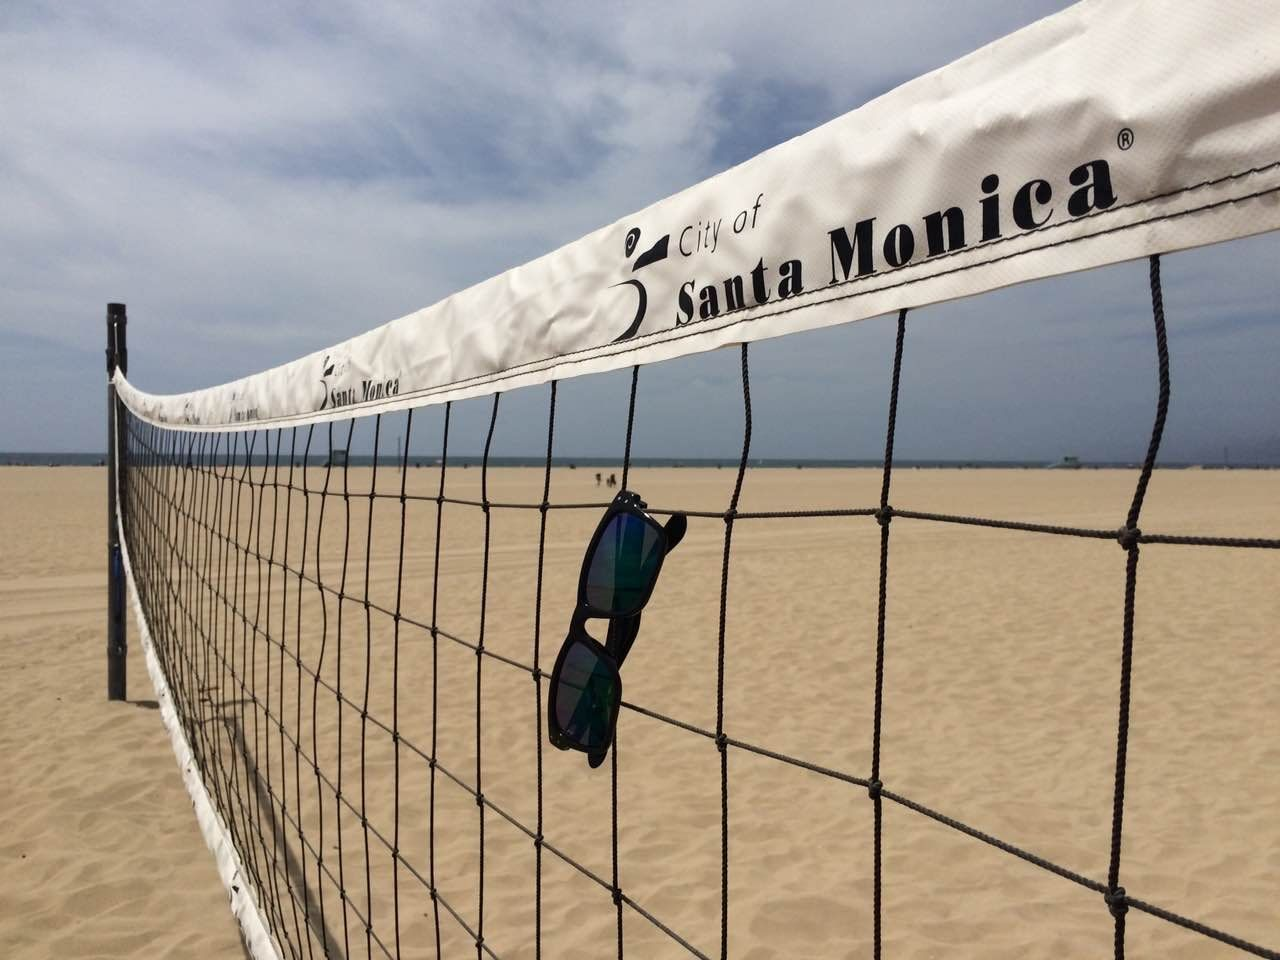 Volleyball Santa Monica Beach And Trioo Polar Seeyourpassion Volei De Praia Cidade Volei